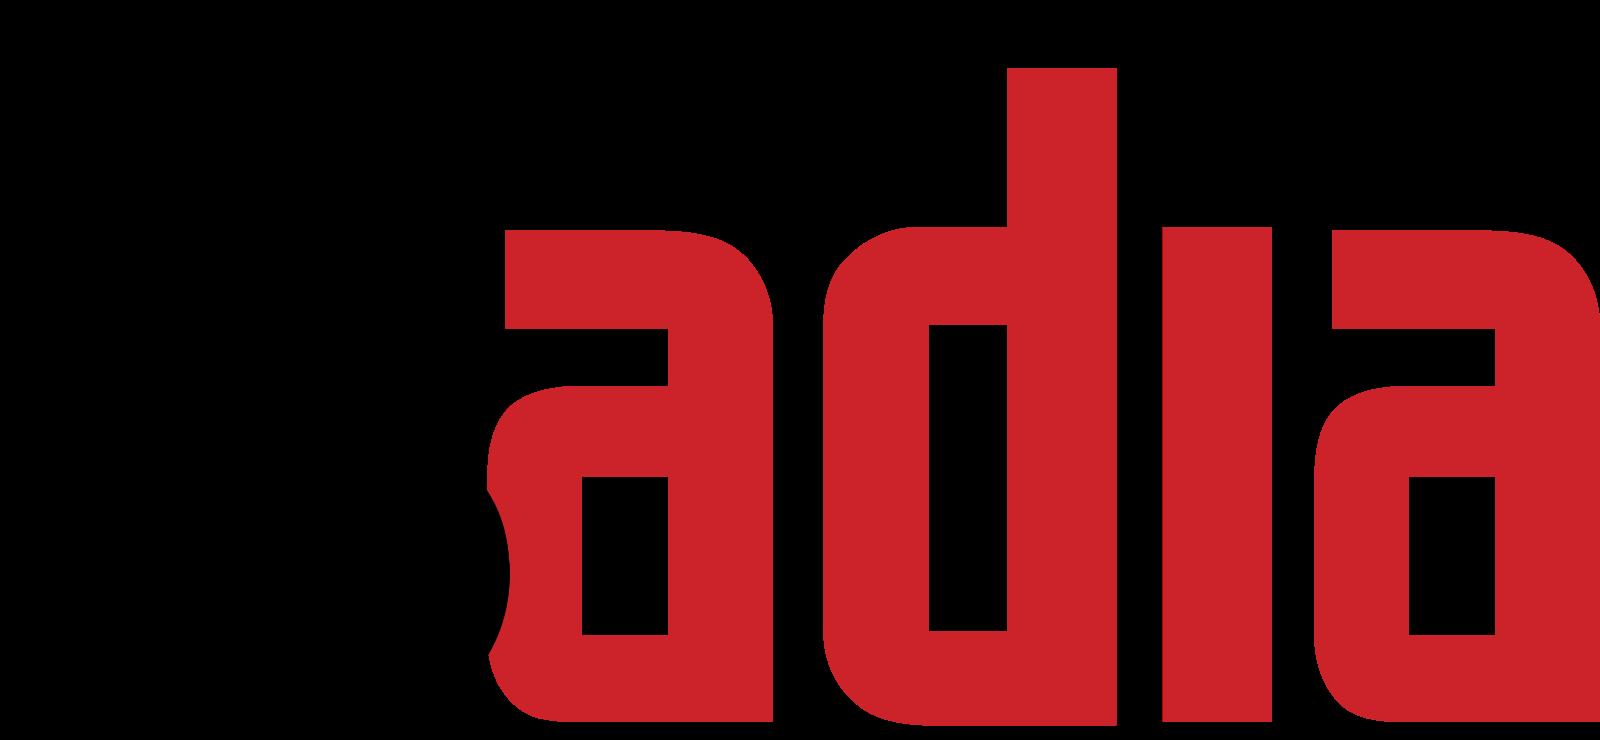 sadia logo 3 - Sadia Logo